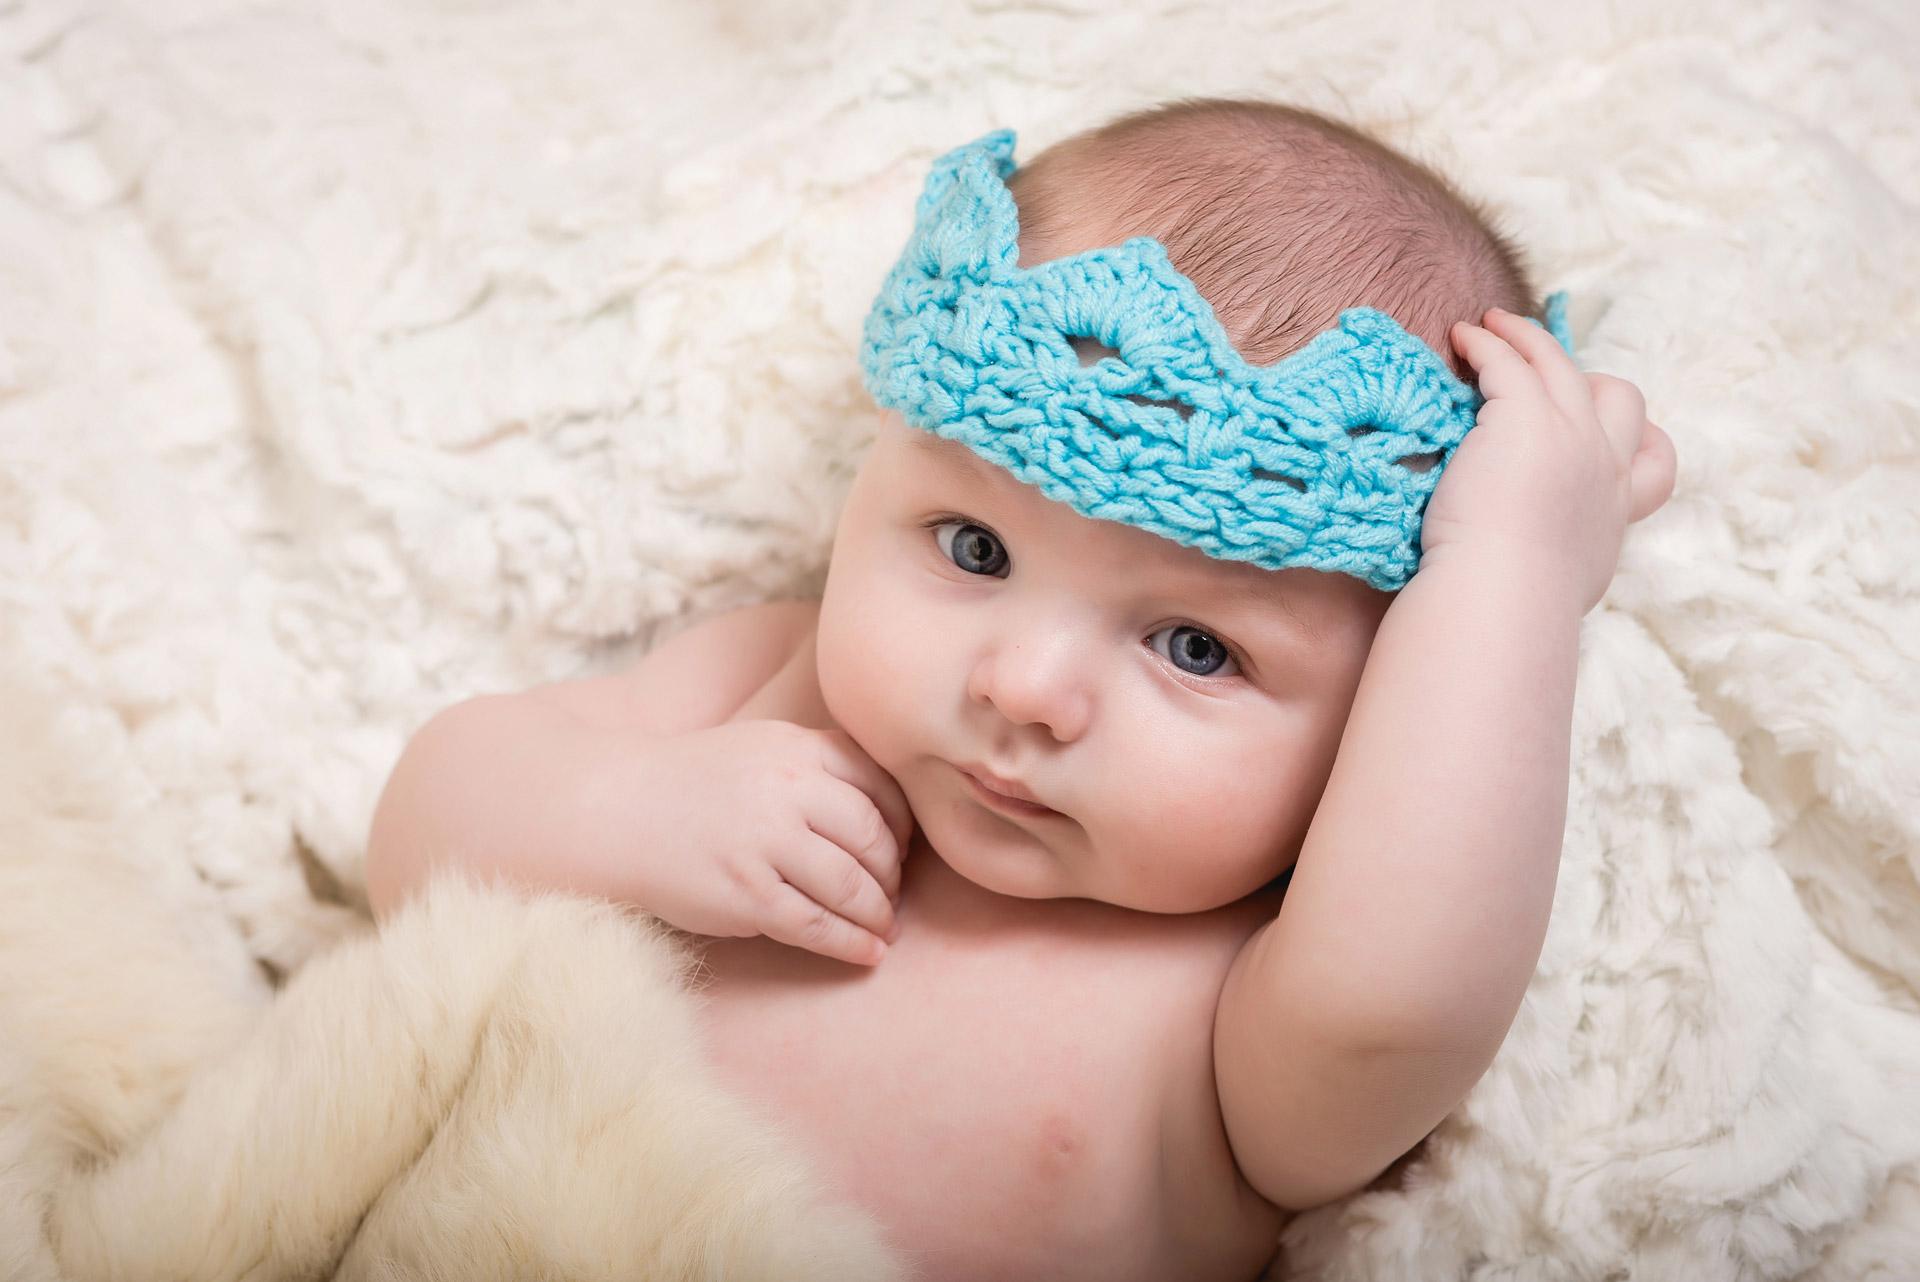 Newborn Baby Portrait Photography 01